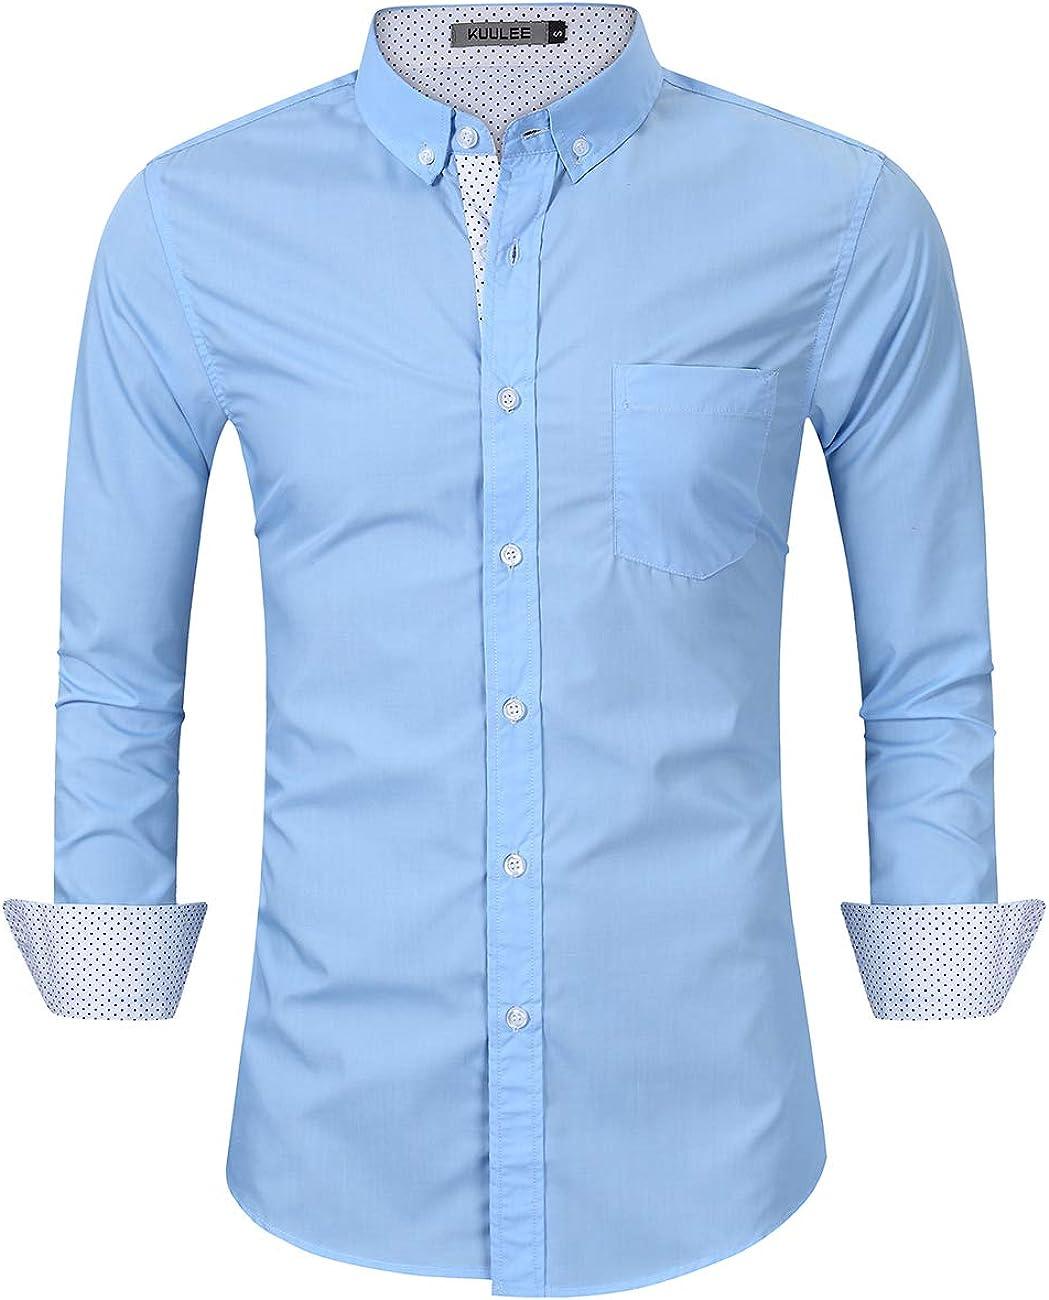 KUULEE Camicia Uomo Slim Fit Elegante Manica Lunga Casual Formale